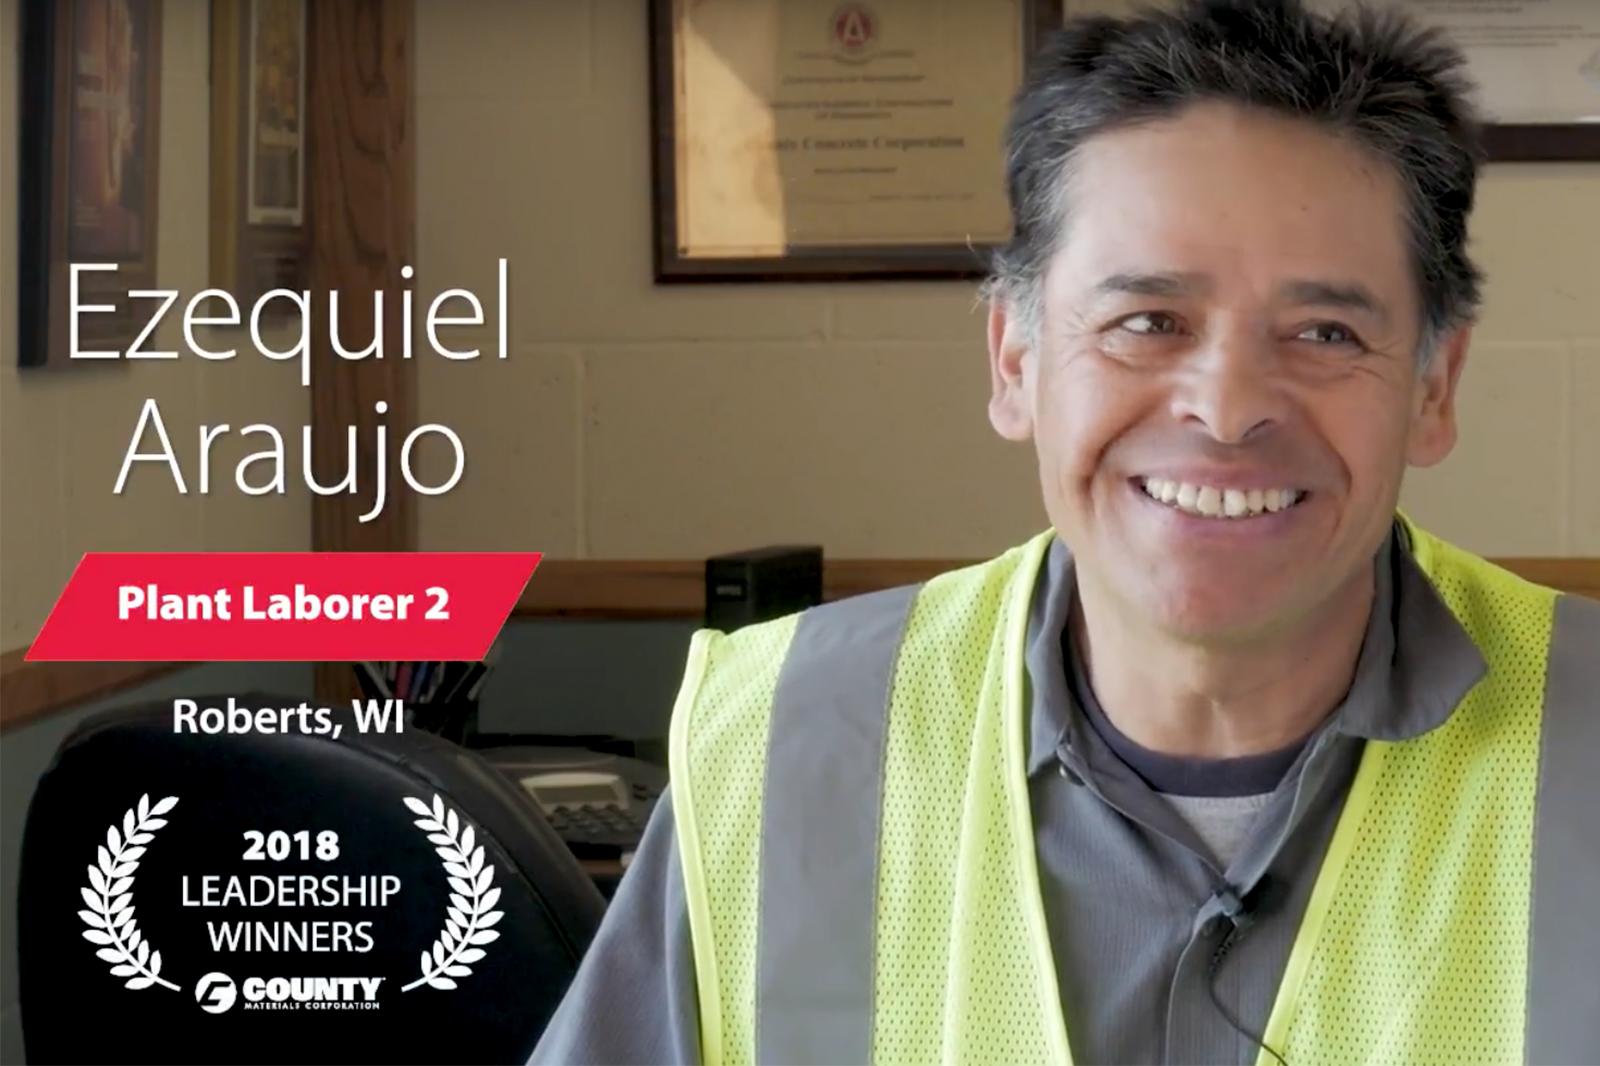 County Materials Congratulates Ezequiel Araujo-2018 First Quarter Leadership Winner